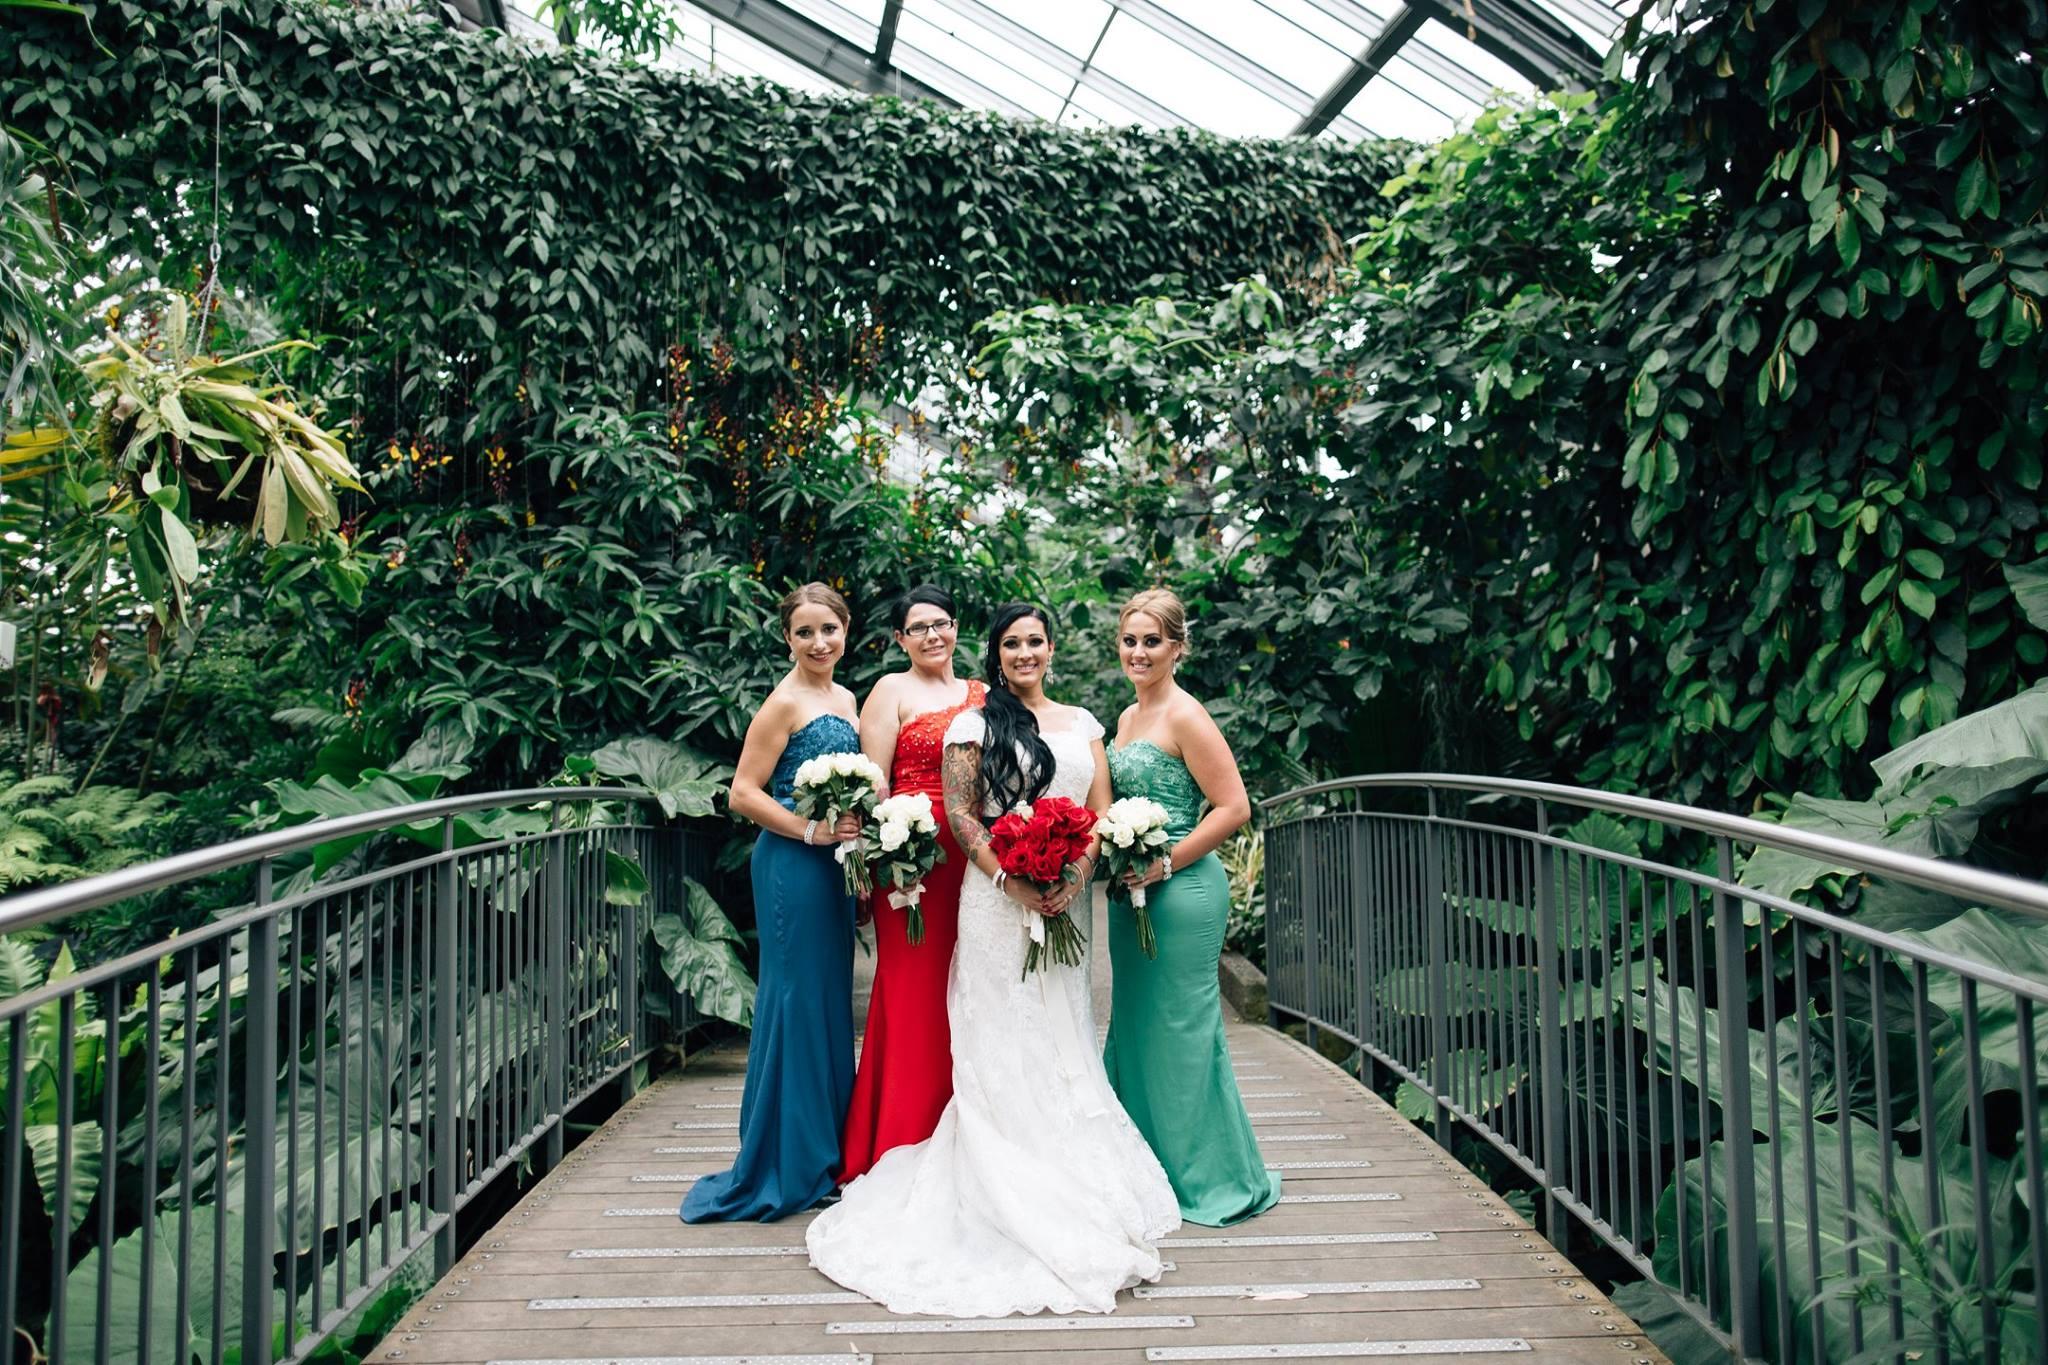 Bride Joe and her Maids